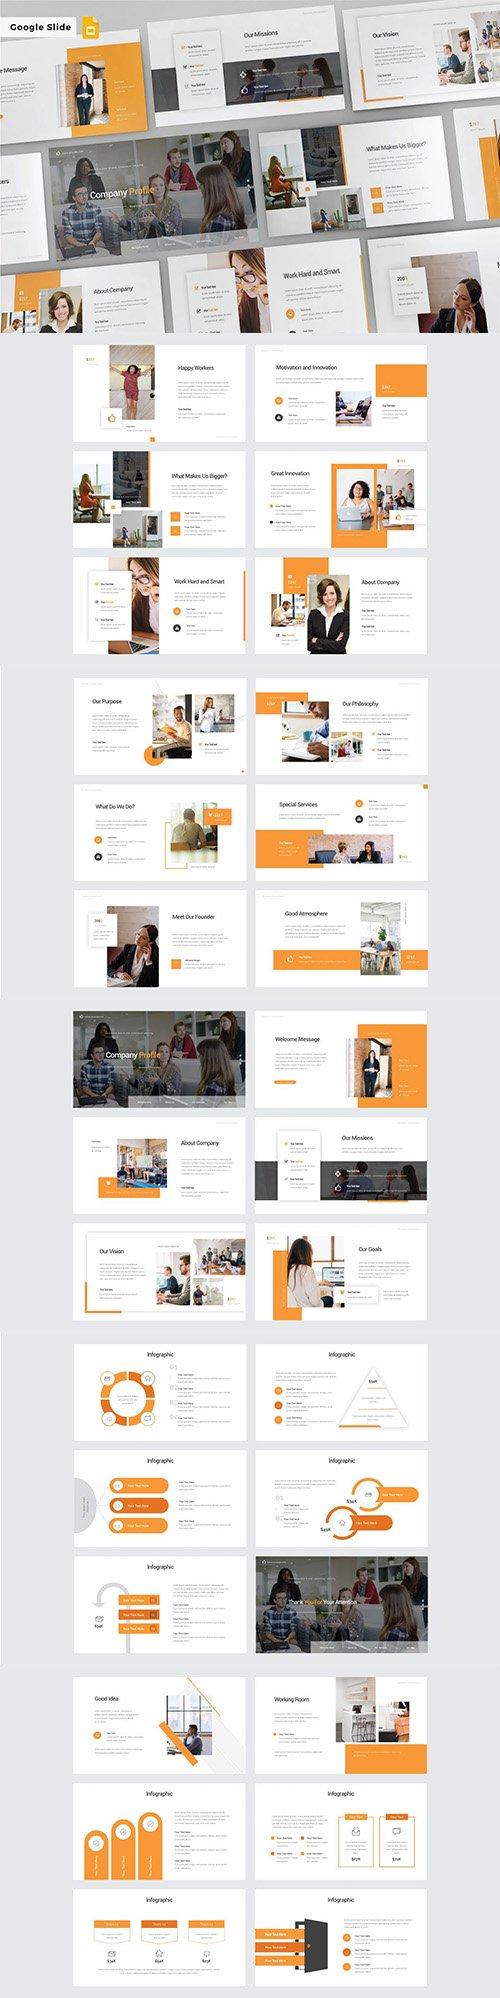 COMPANY PROFILE - Google Slide PPTX Template V178